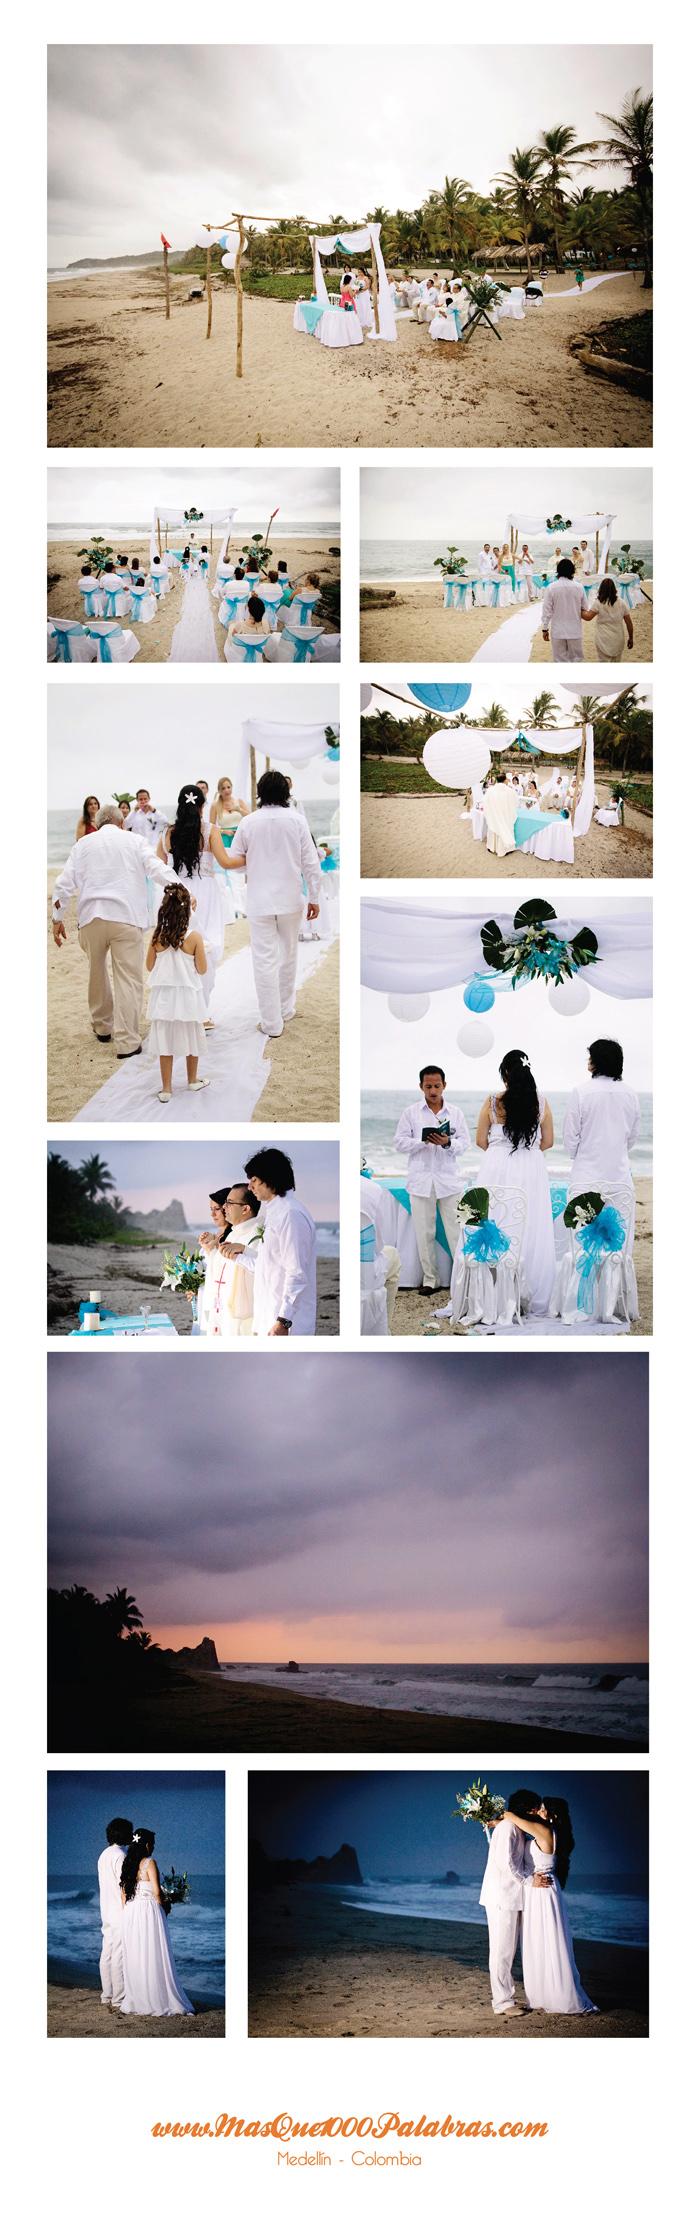 Matrimonio tayrona